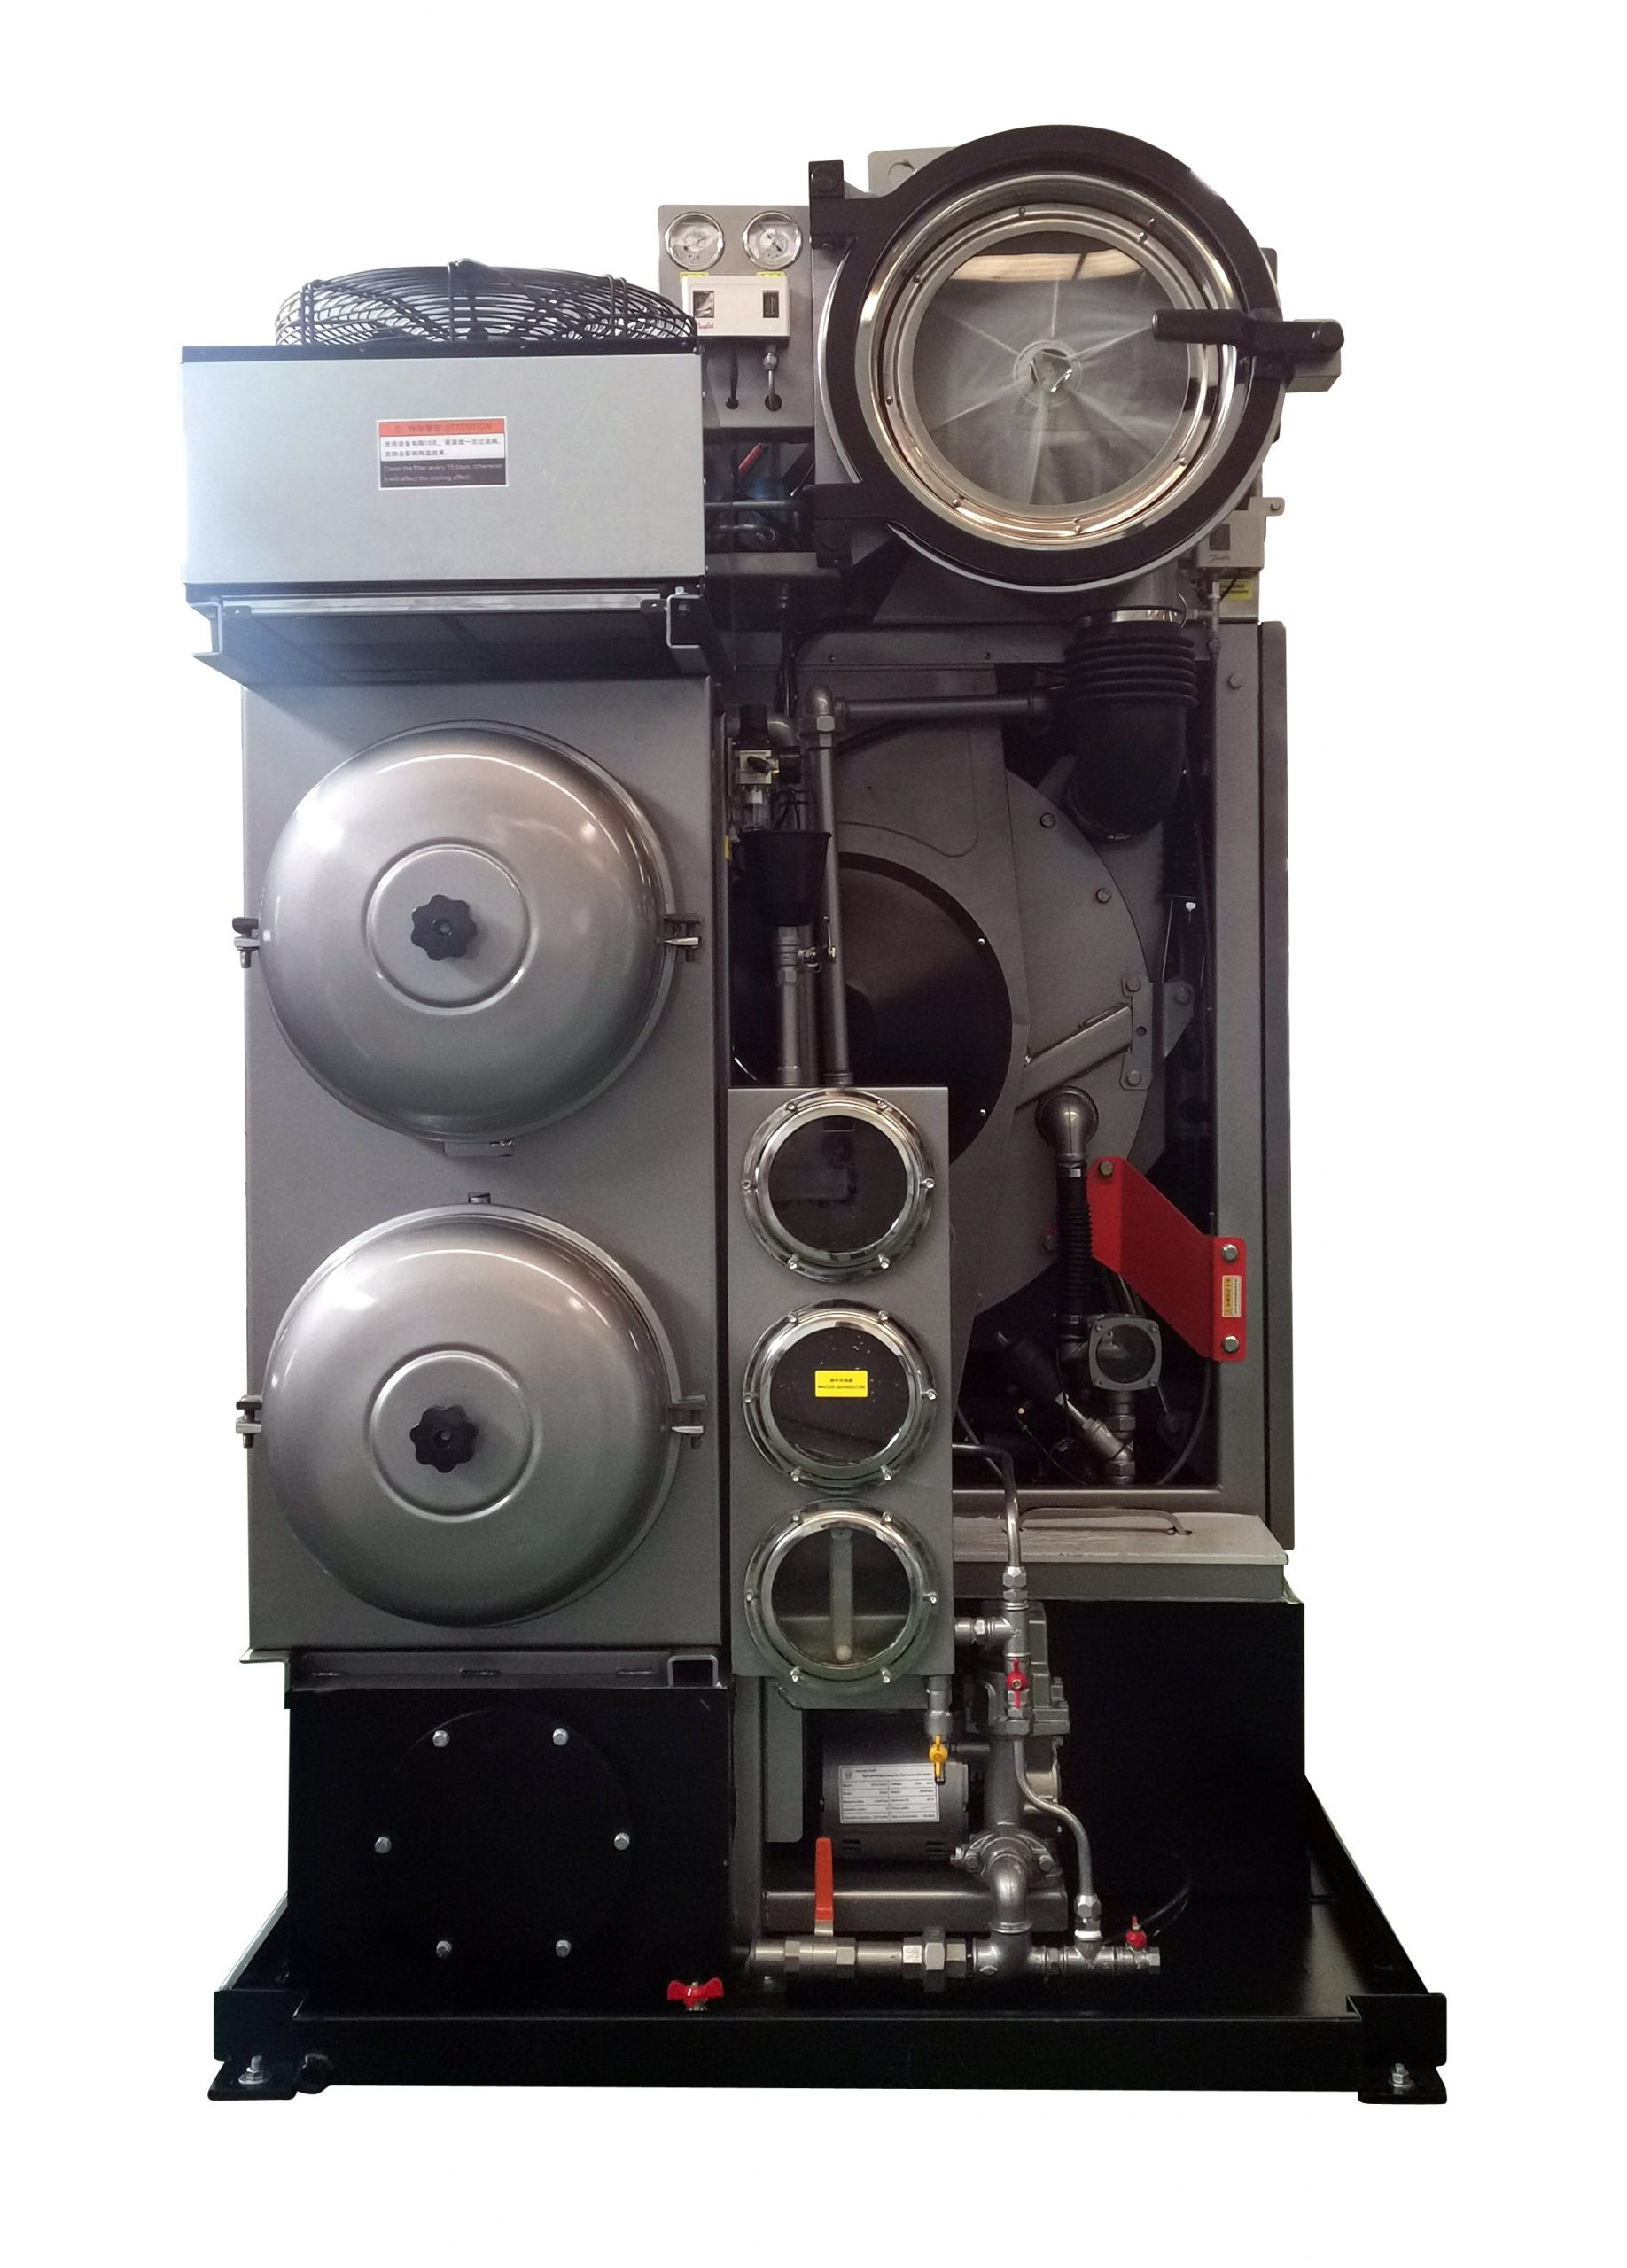 HSE系列高速全封闭多溶剂干洗机